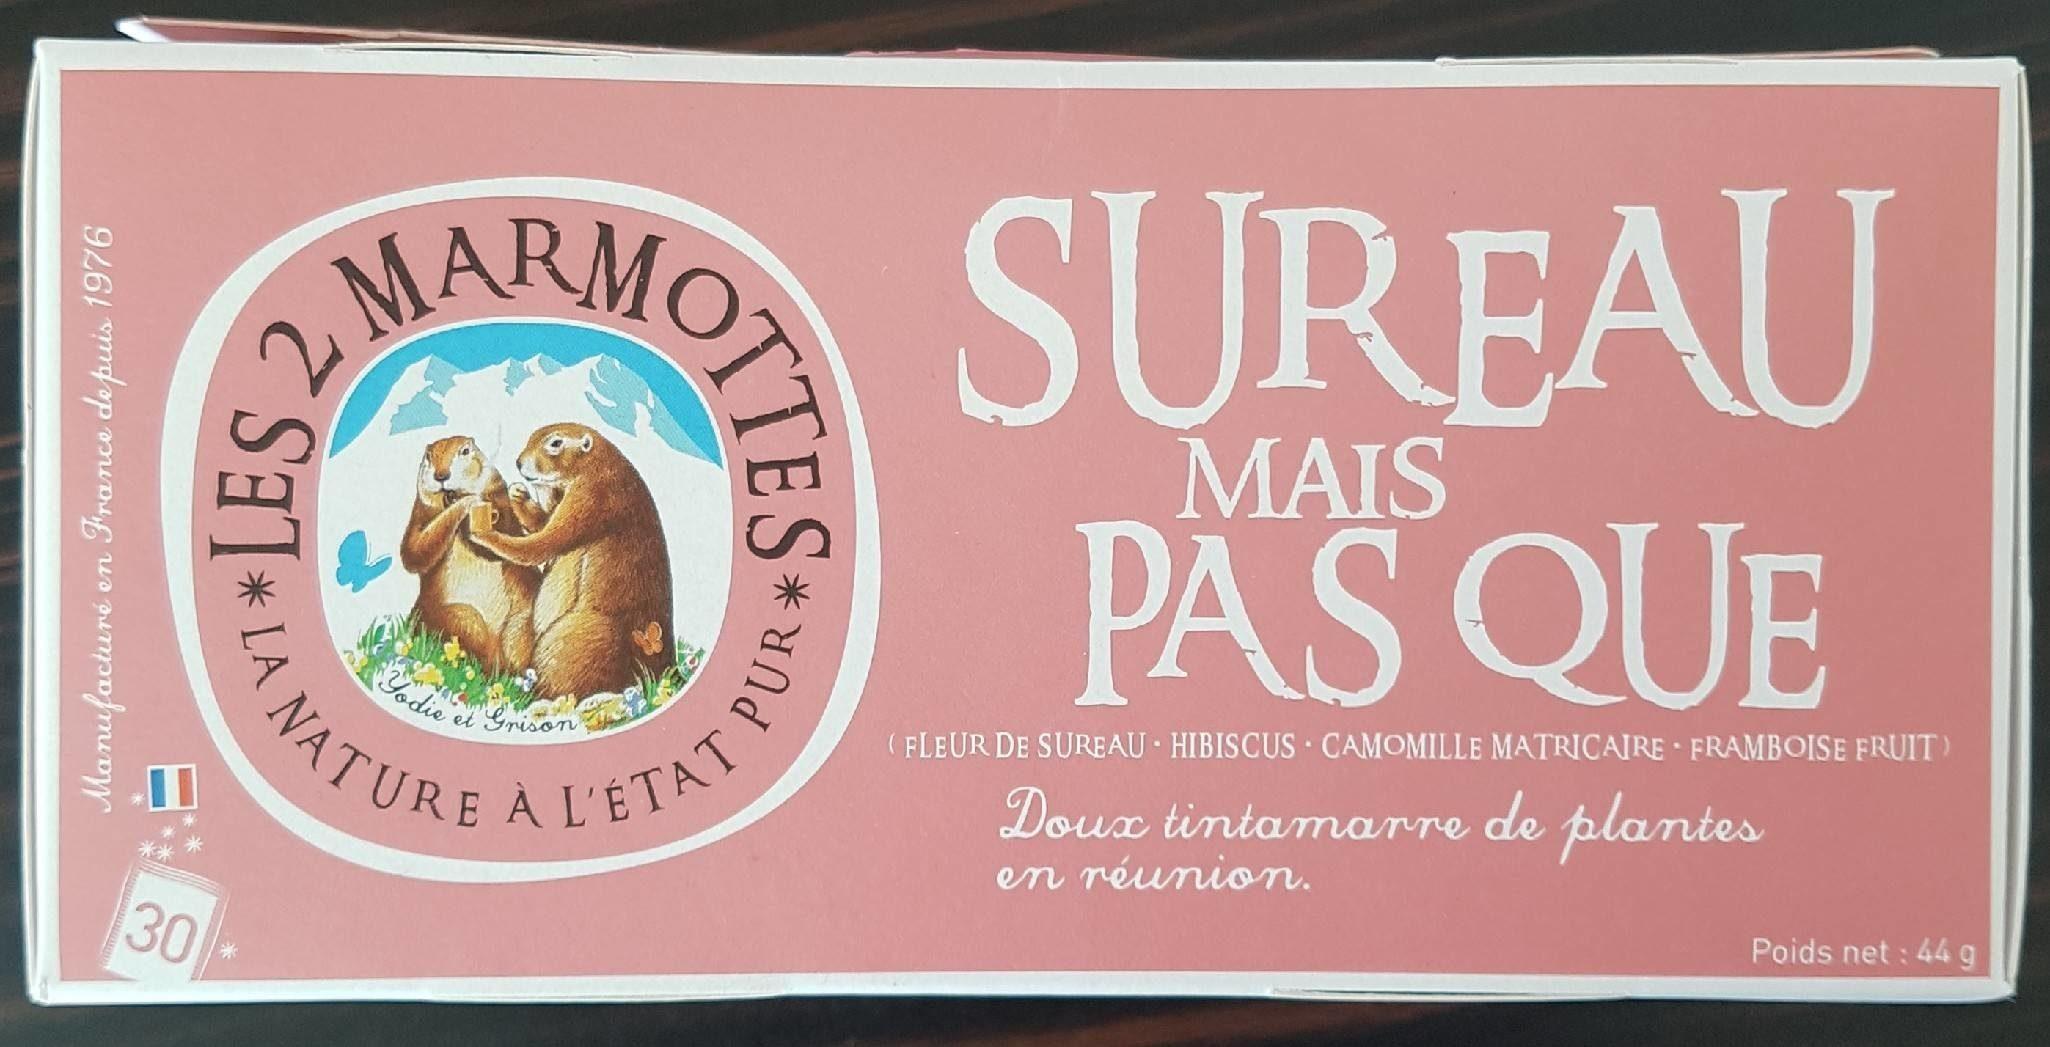 Tisane de Sureau mais pas que... - Prodotto - fr